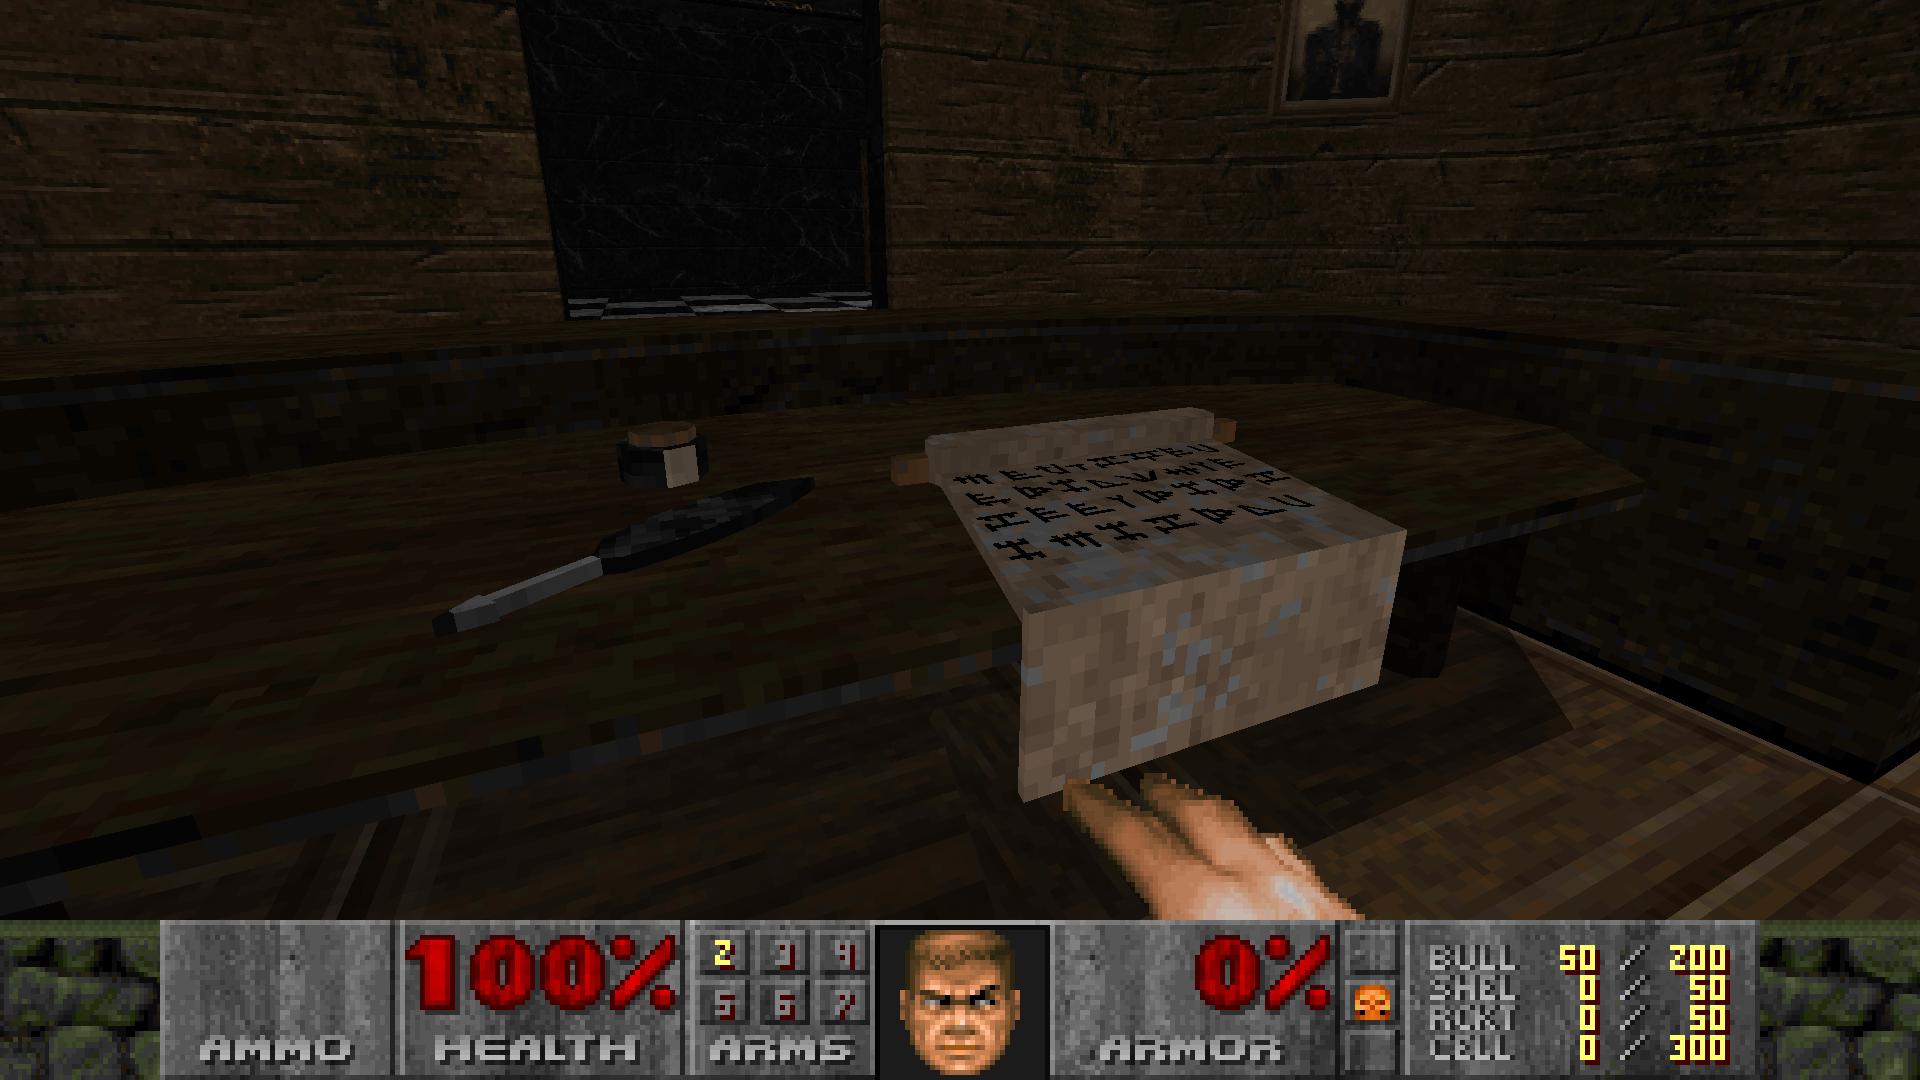 Screenshot_Doom_20201209_190747.png.69da0820e9ac4f9f388bba68c990cf9c.png